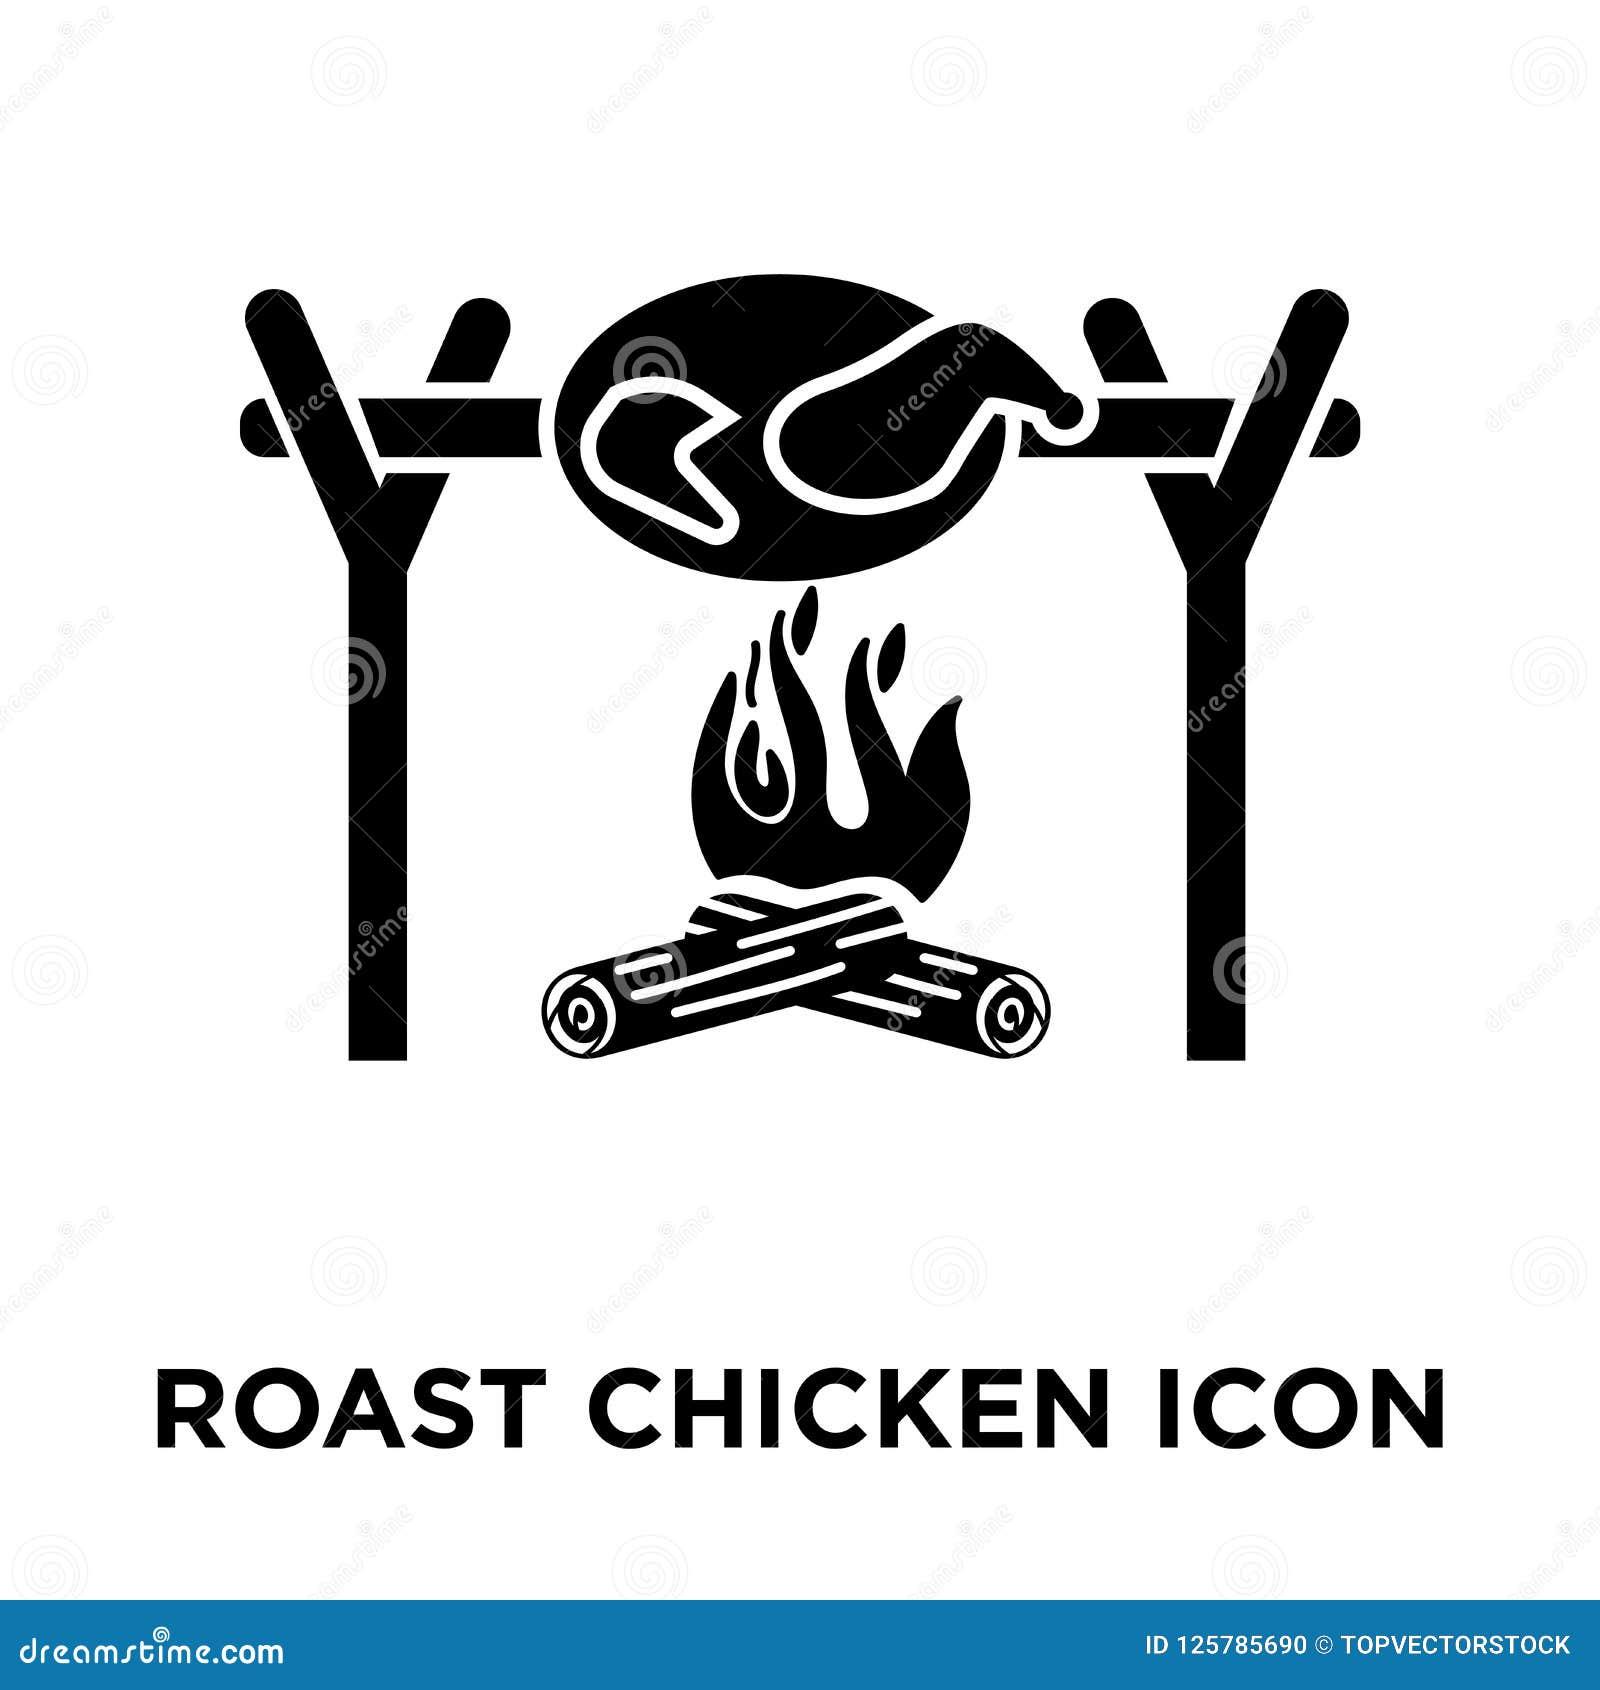 Whole roast chicken from tribalium81, Royalty-free vector ...  Roast Chicken Vector